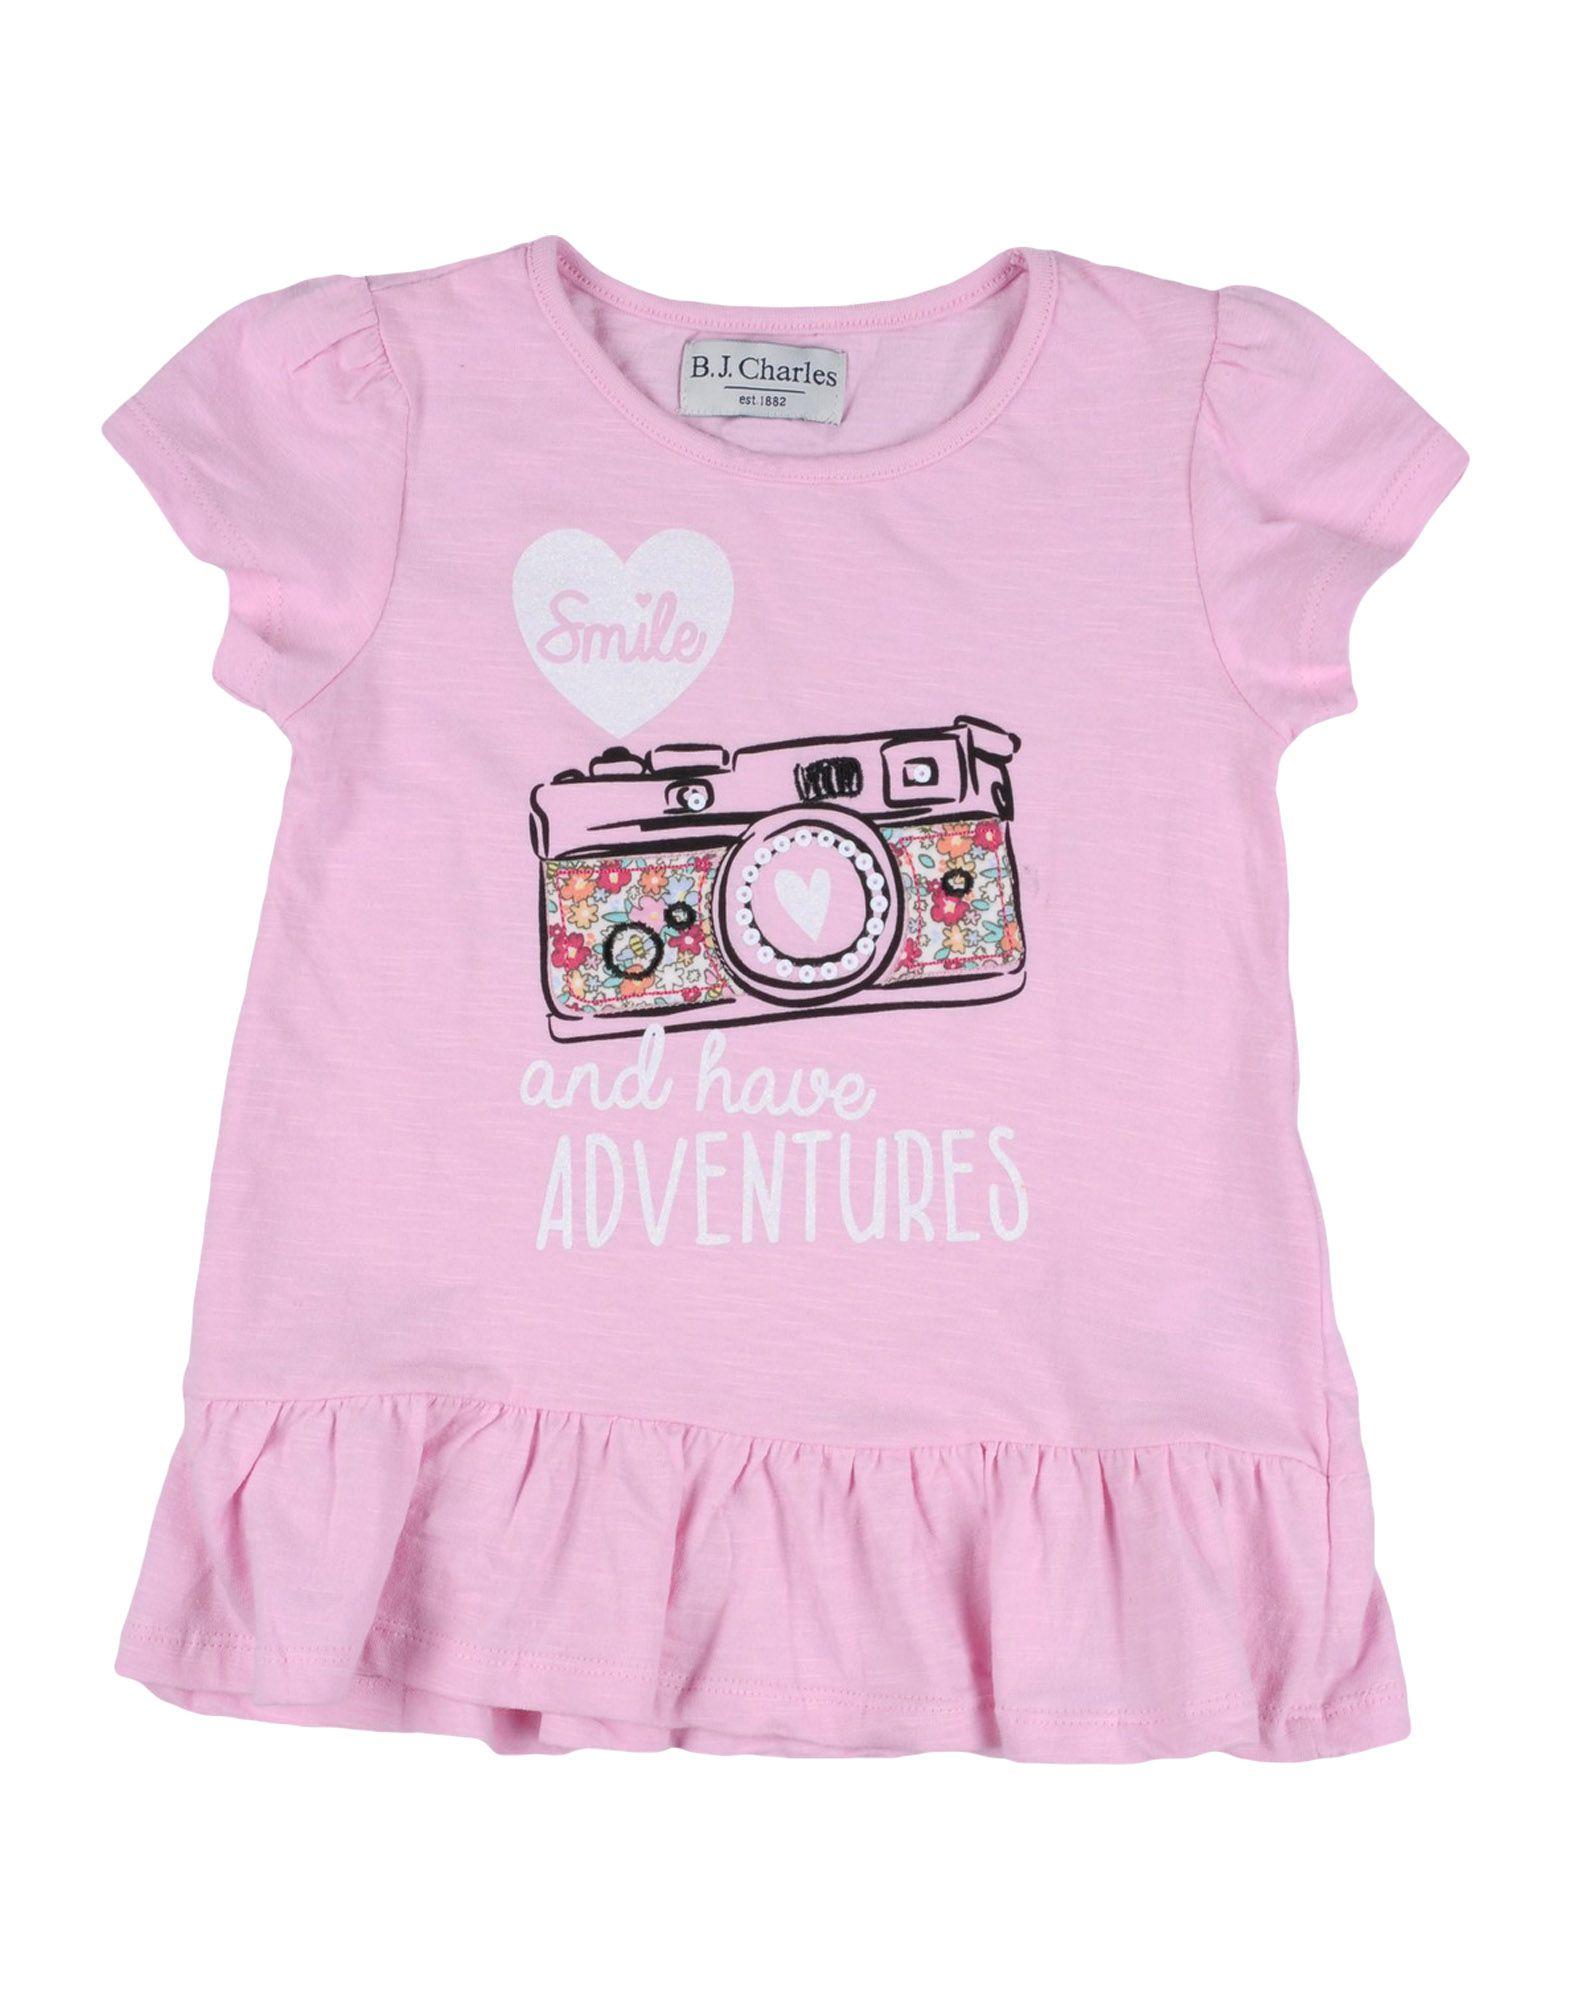 B.j.charles Kids' T-shirts In Pink